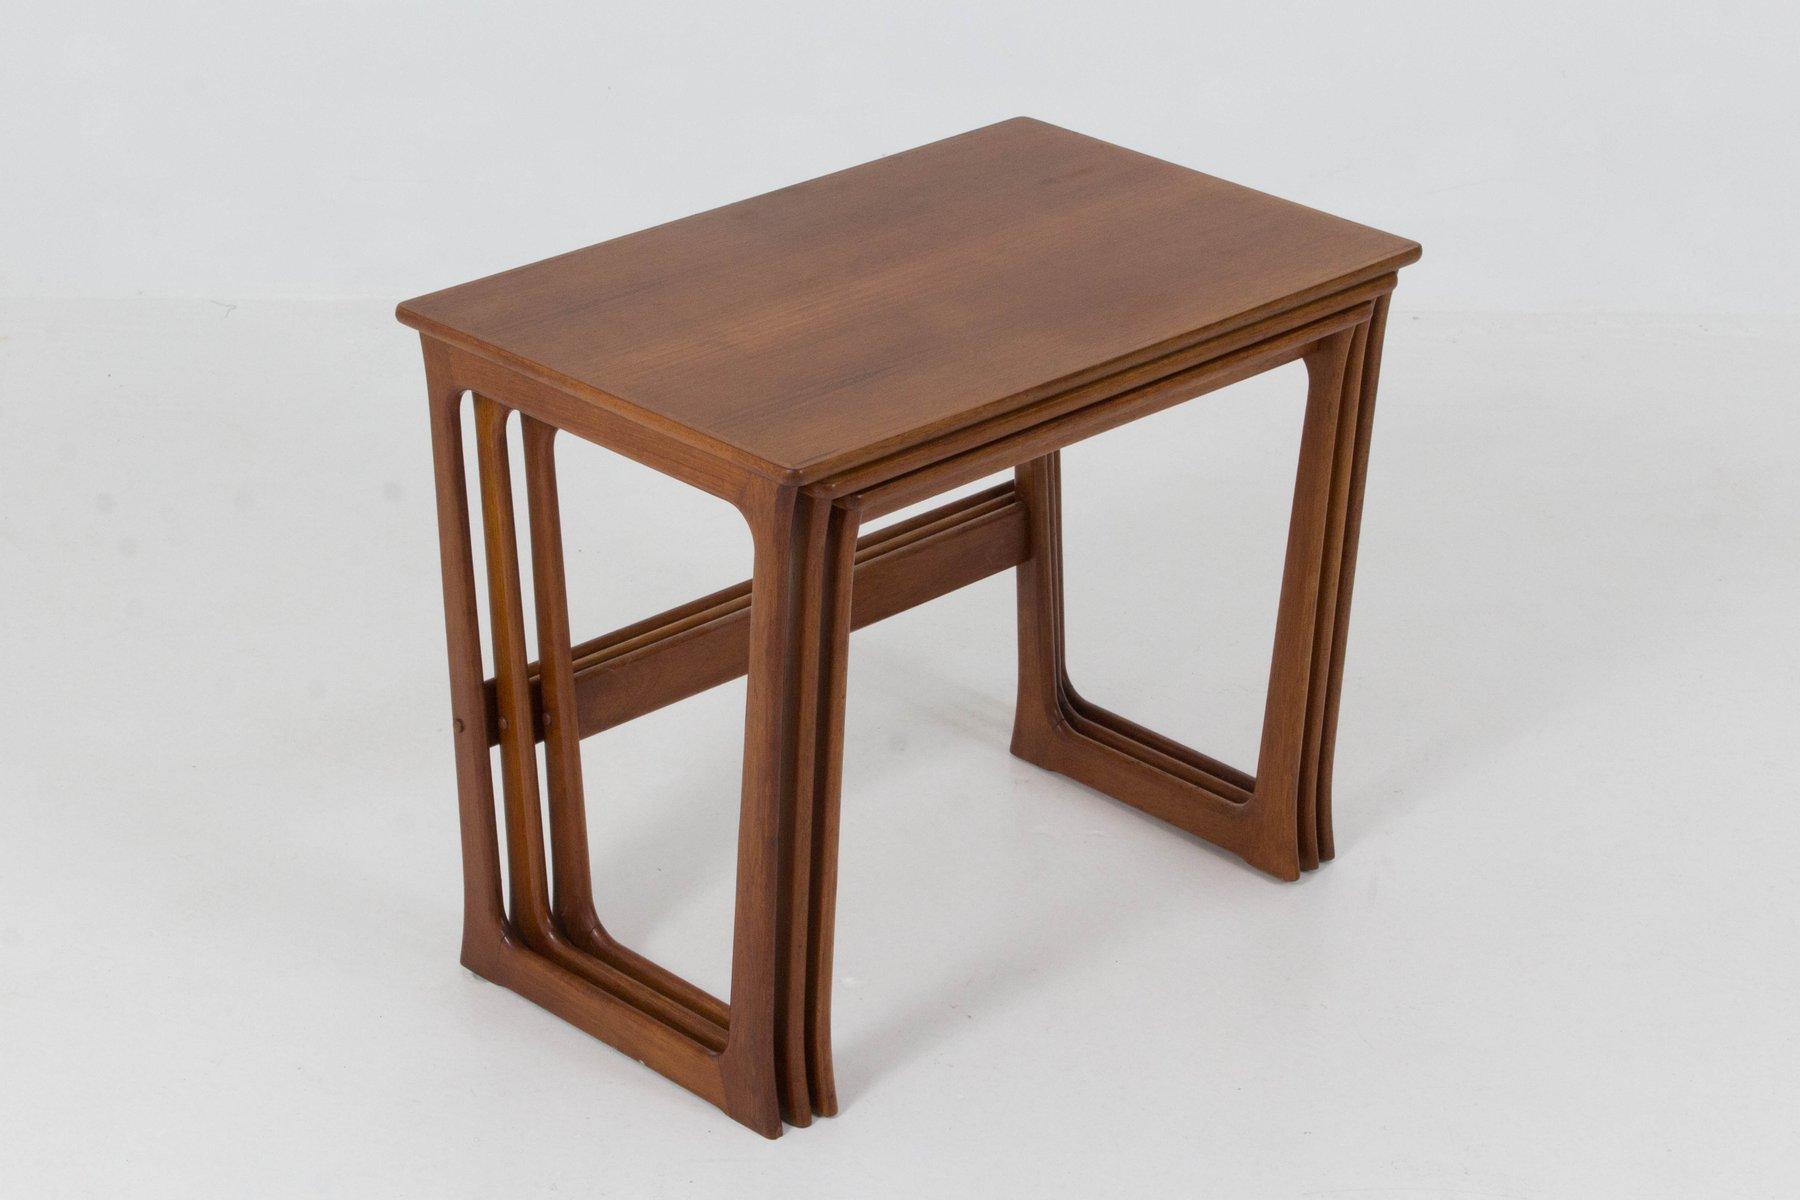 Mid Century Danish Modern Nesting Tables By Johannes Andersen, 1960s